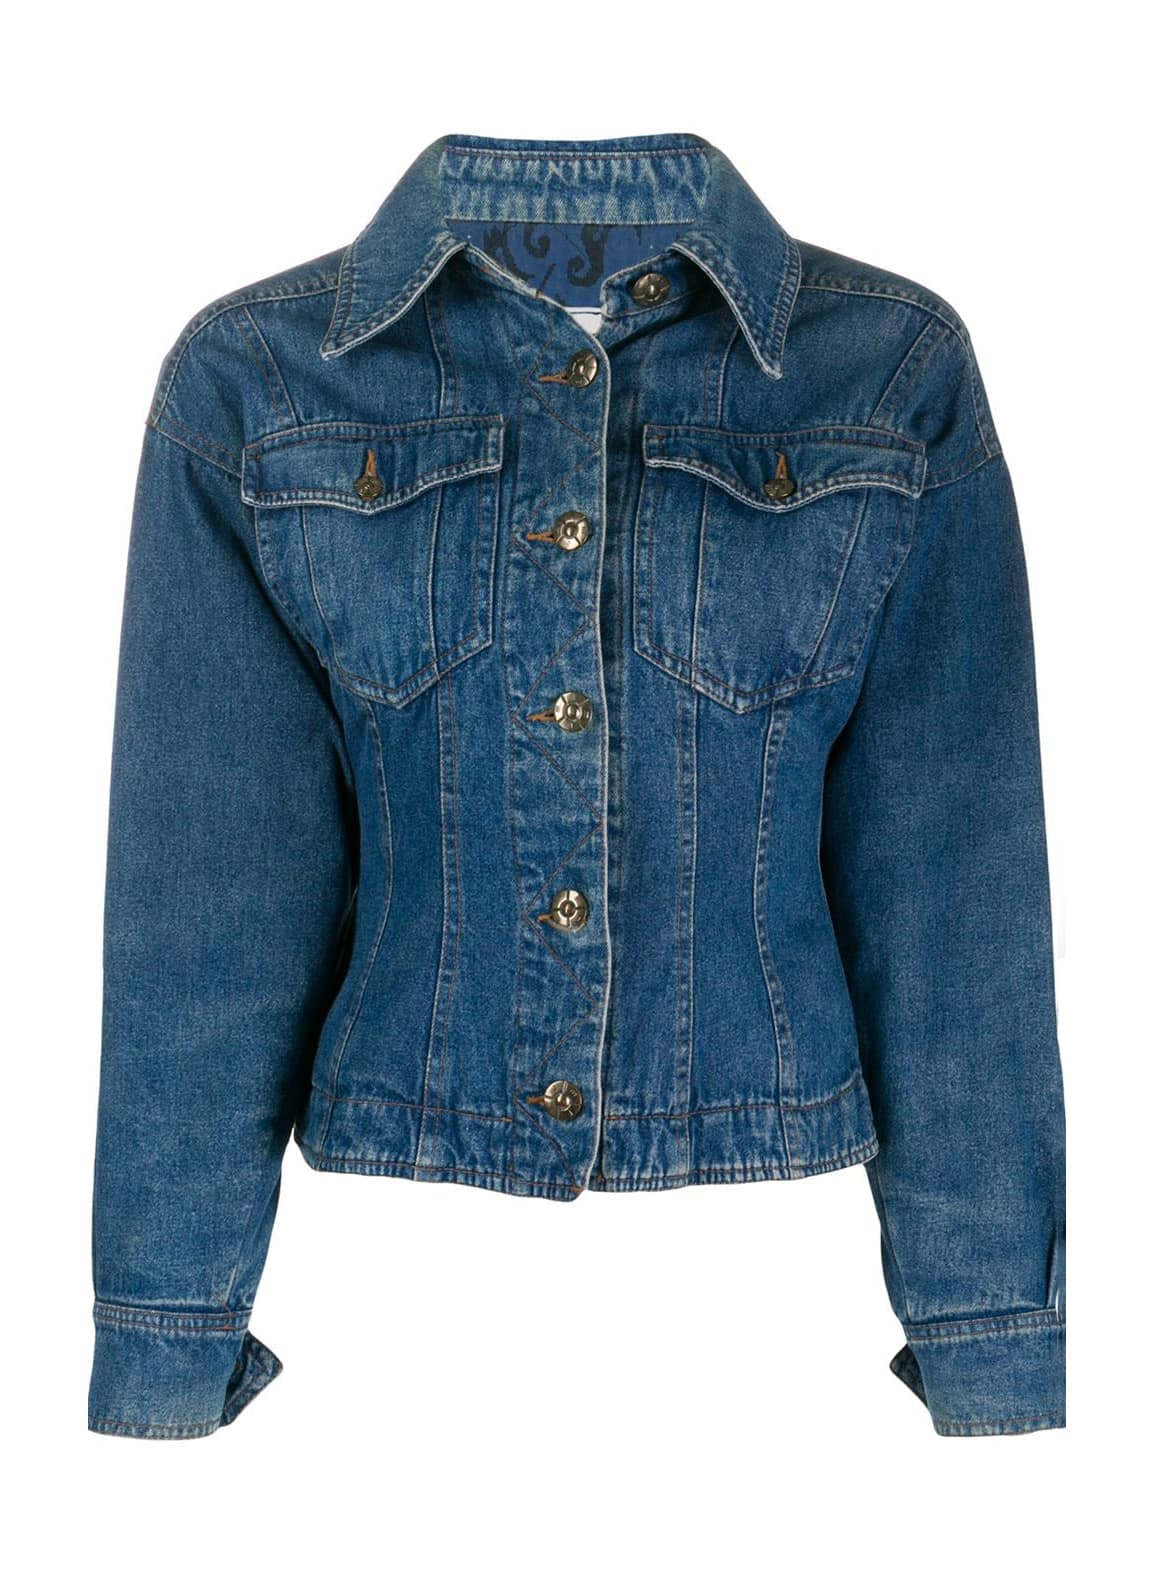 Fendi Pre-Owned 1990s denim jacket